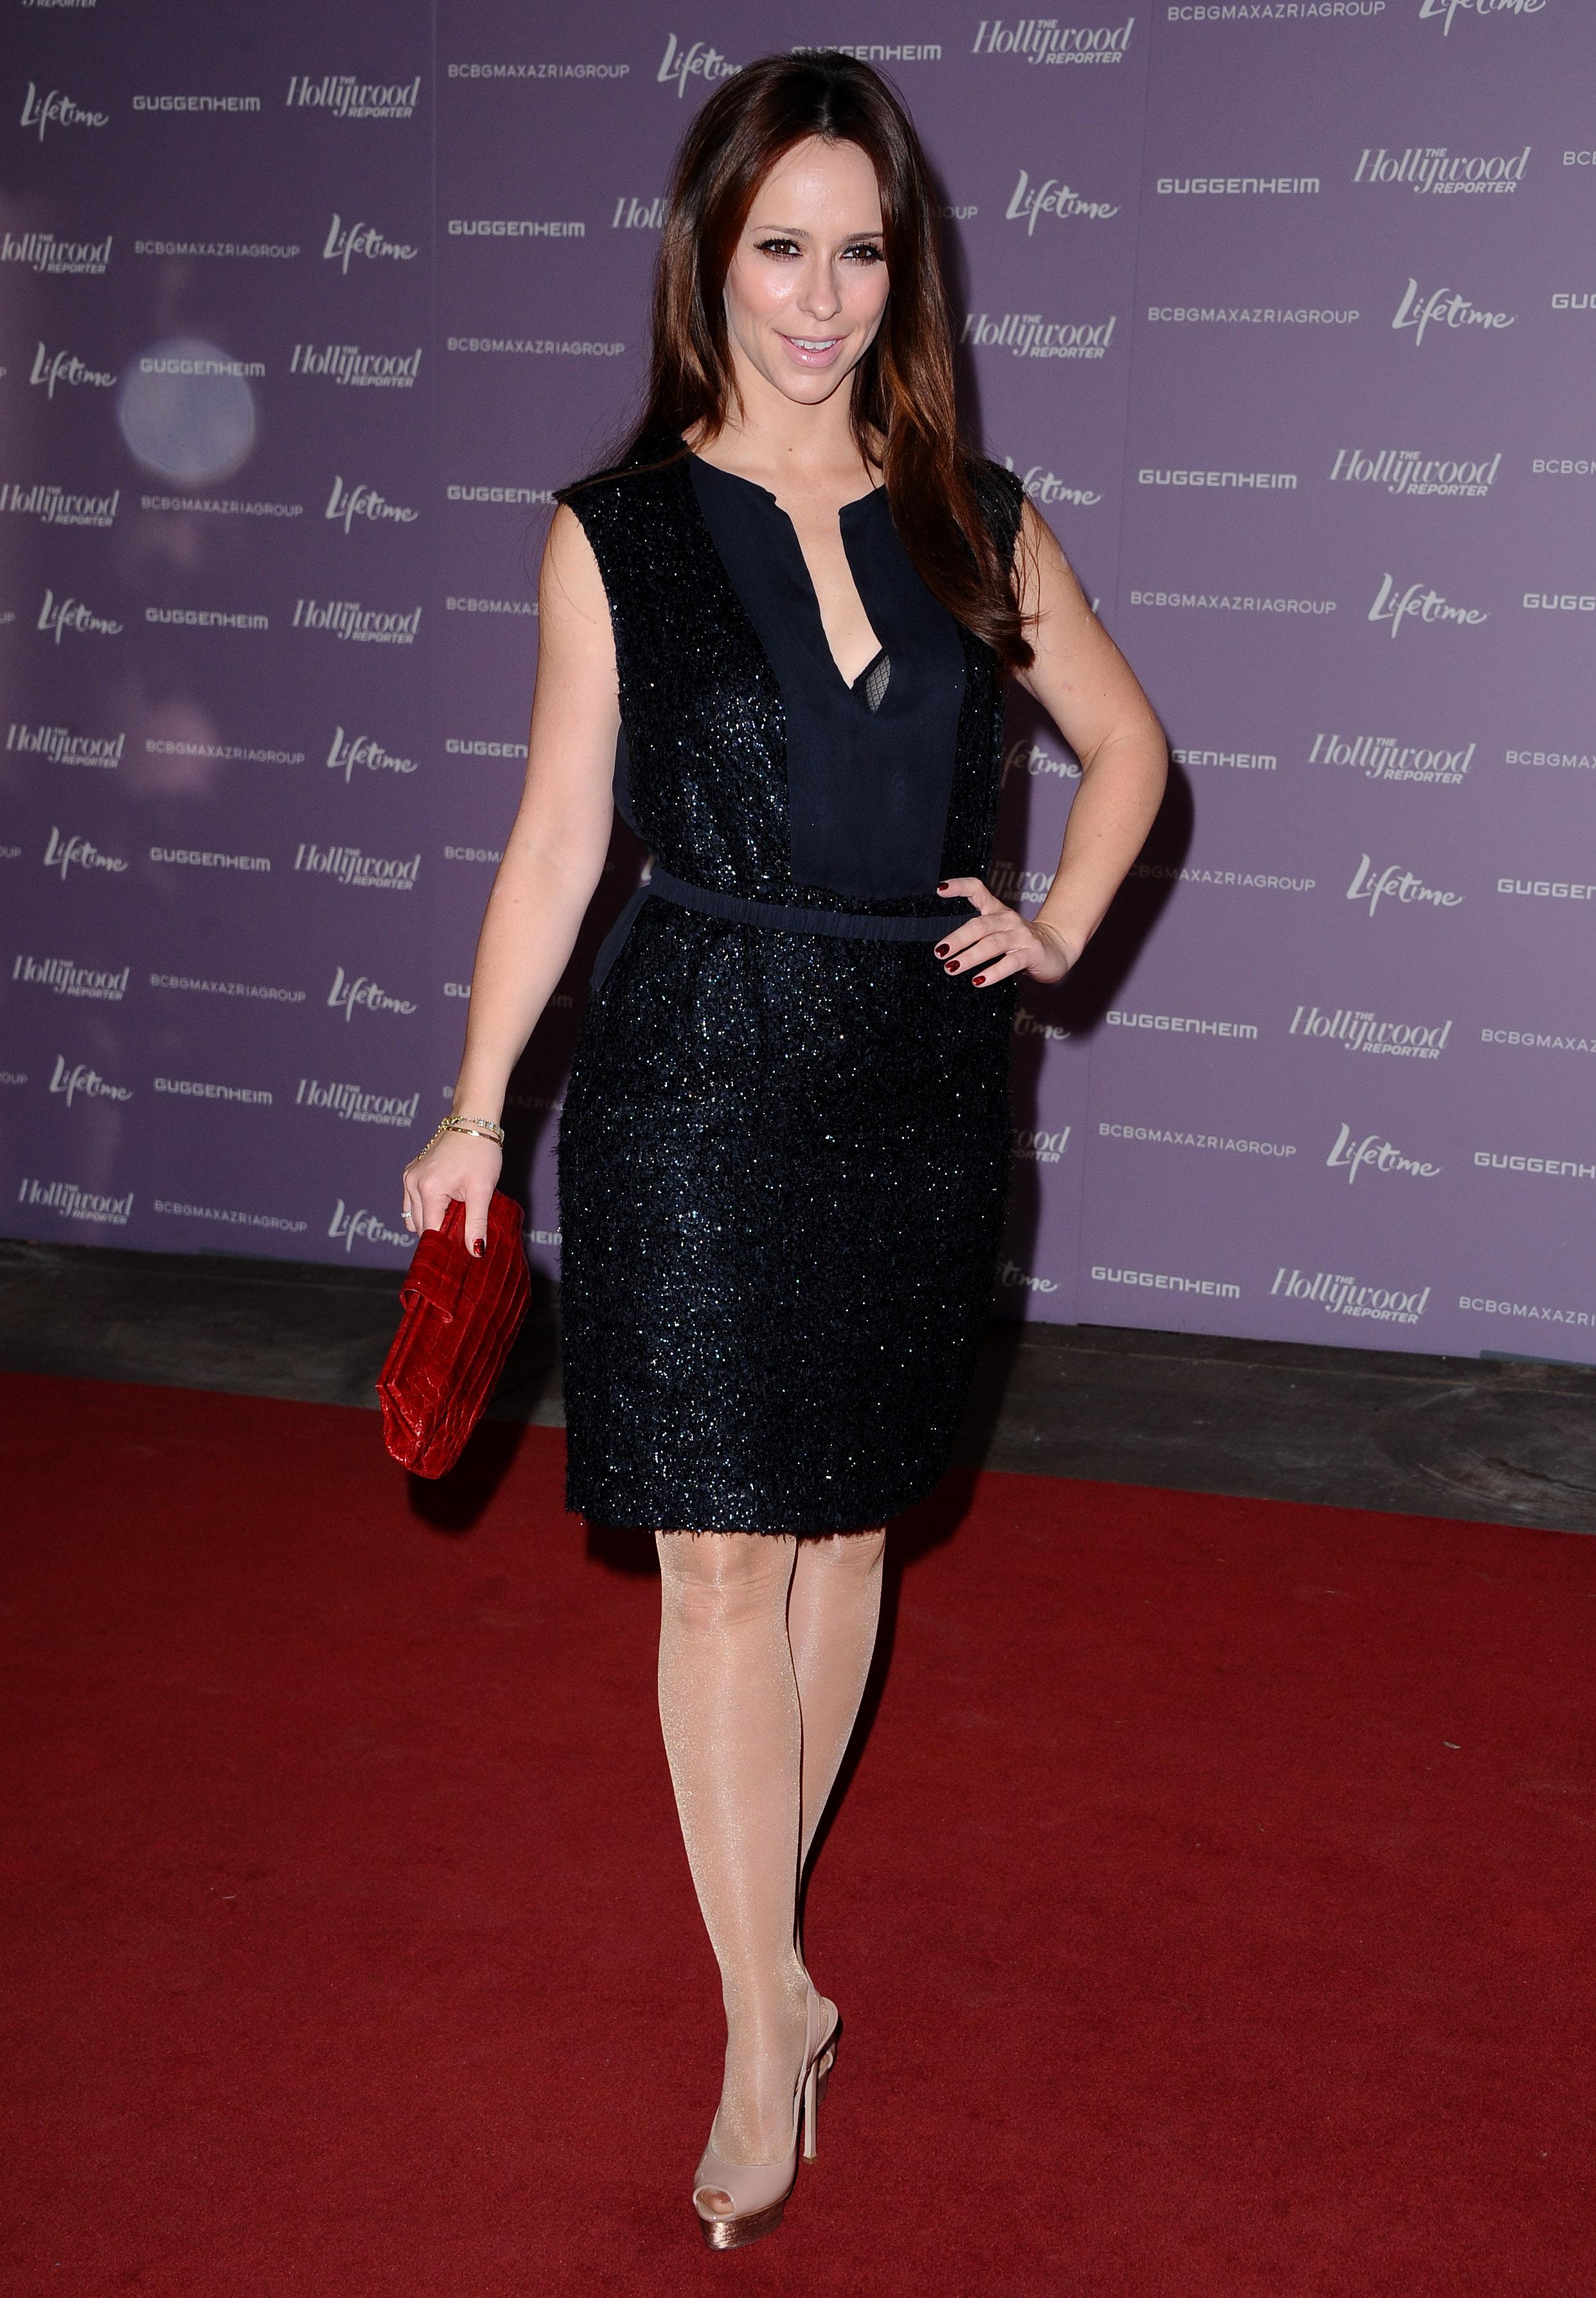 Jennifer Love Hewitt Leggy In Black Dress At Women In